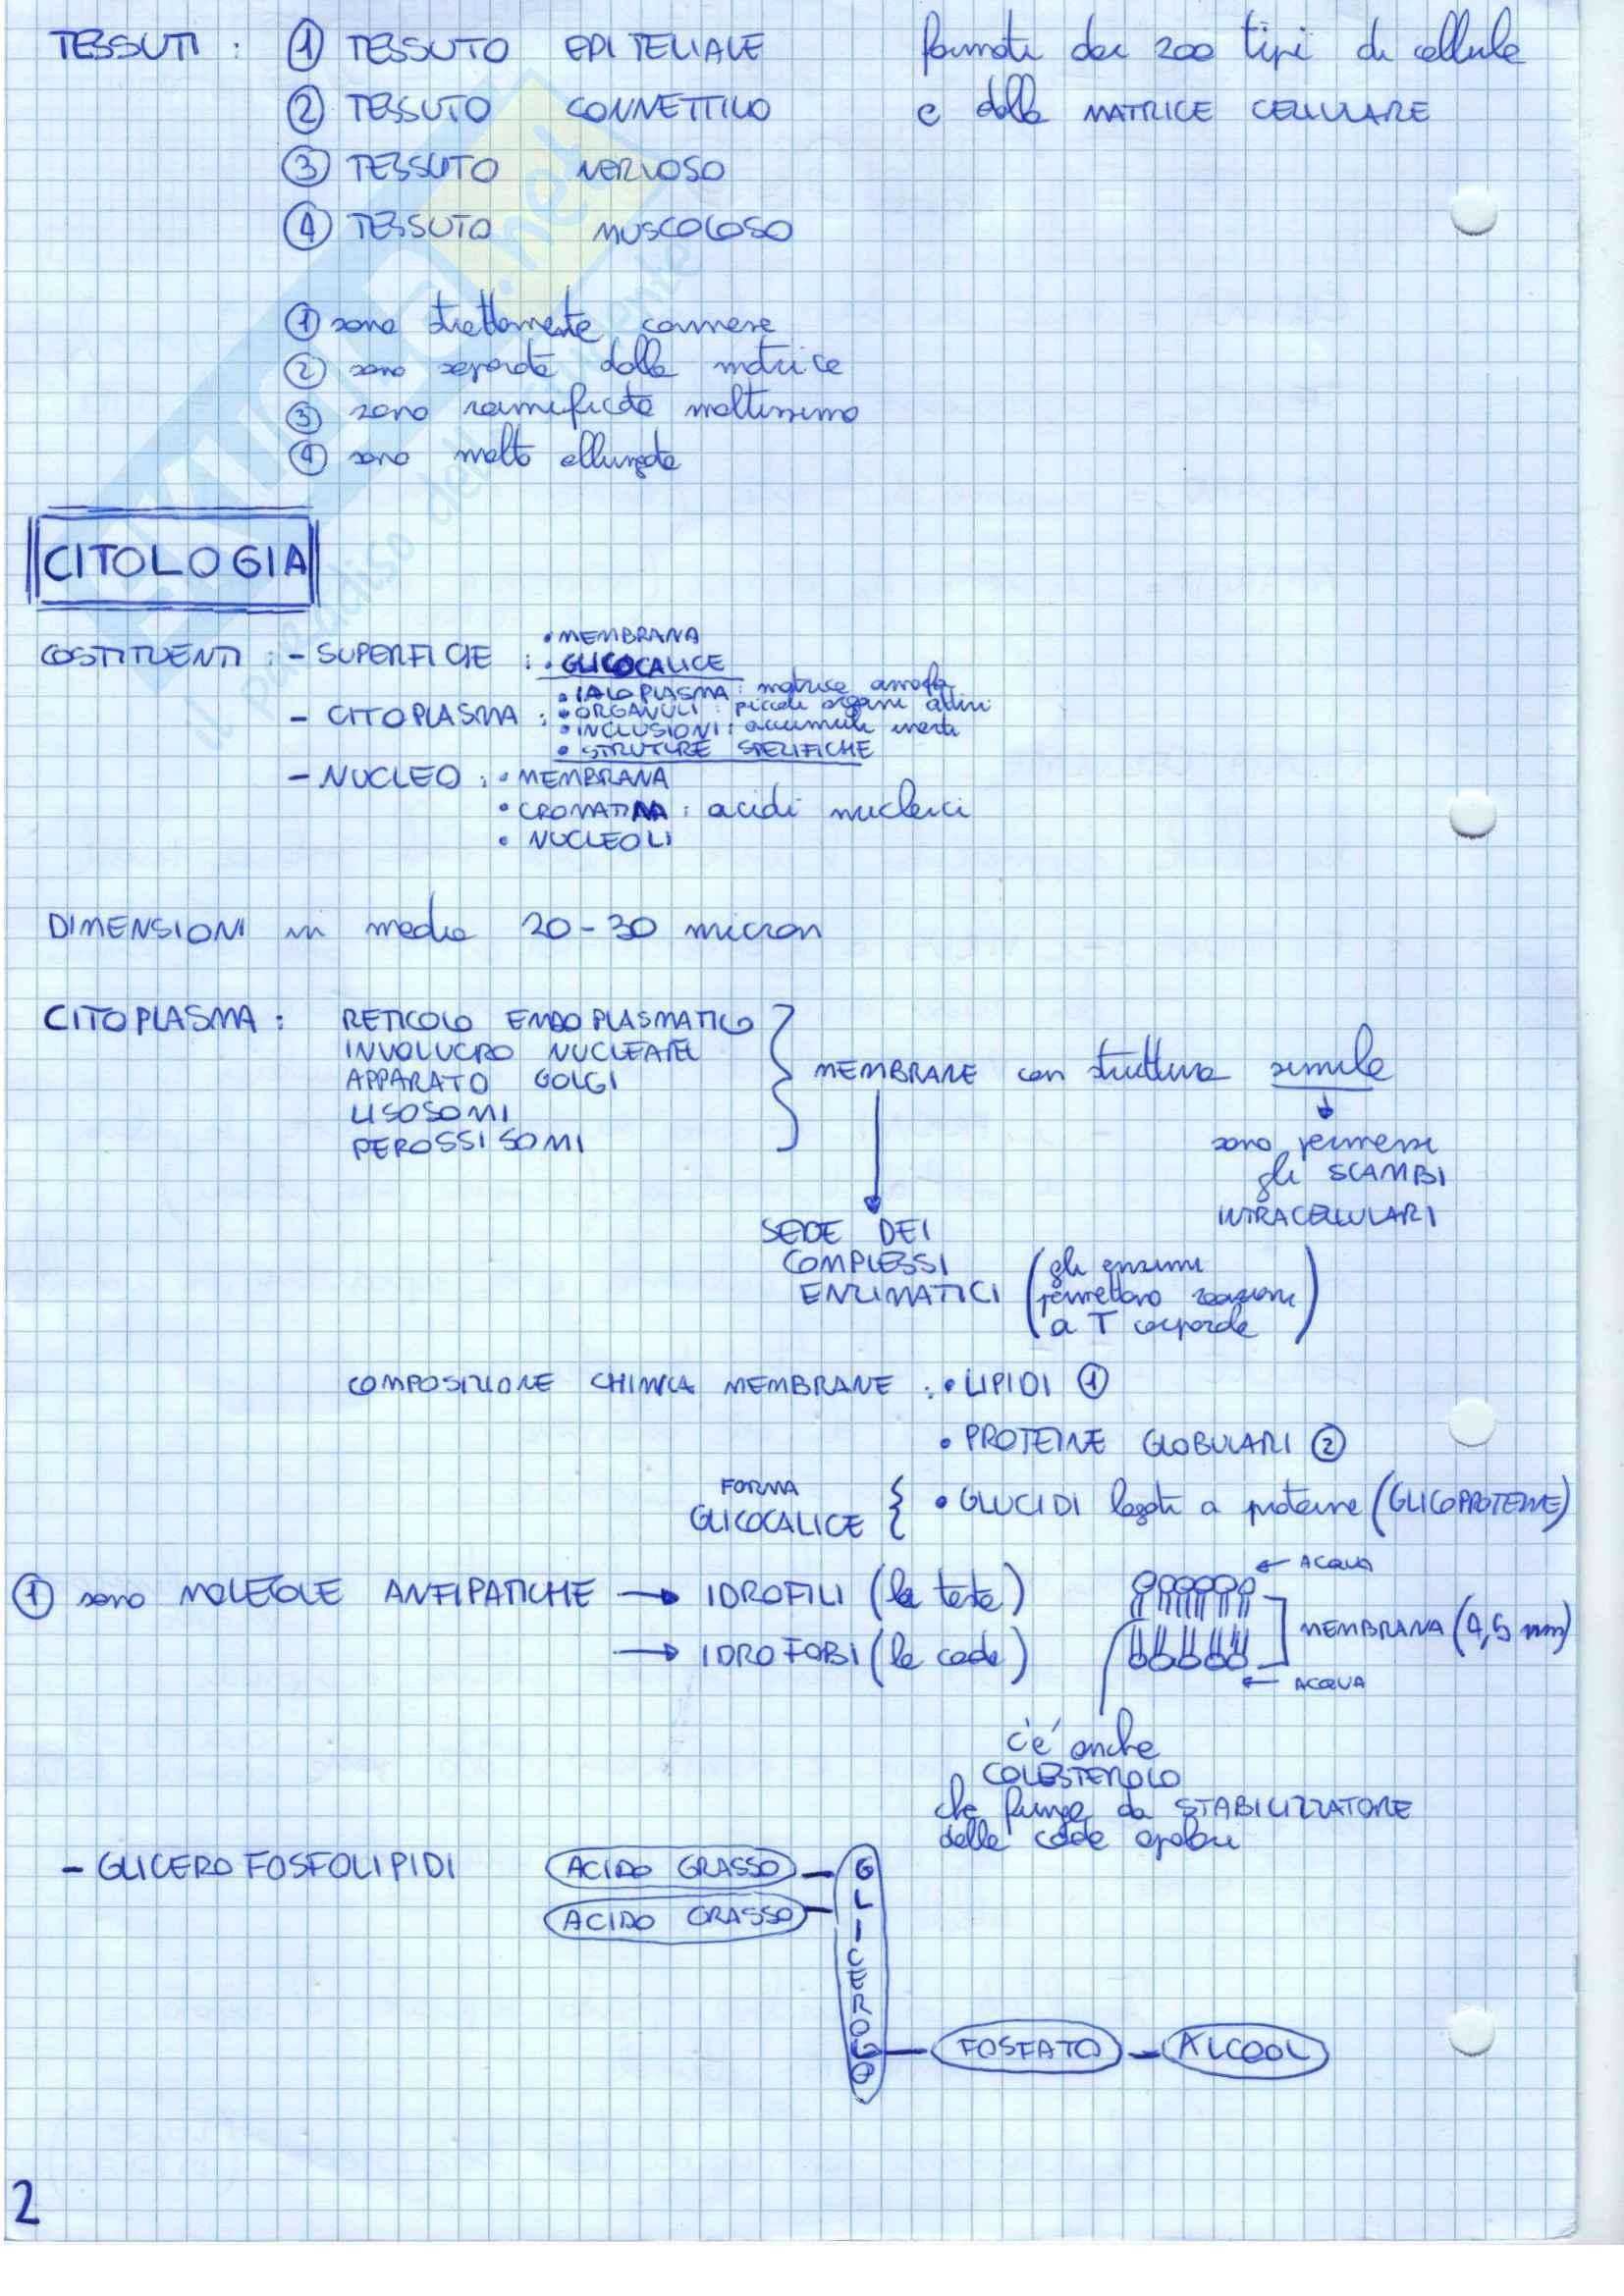 Lezioni, Citologia Pag. 2